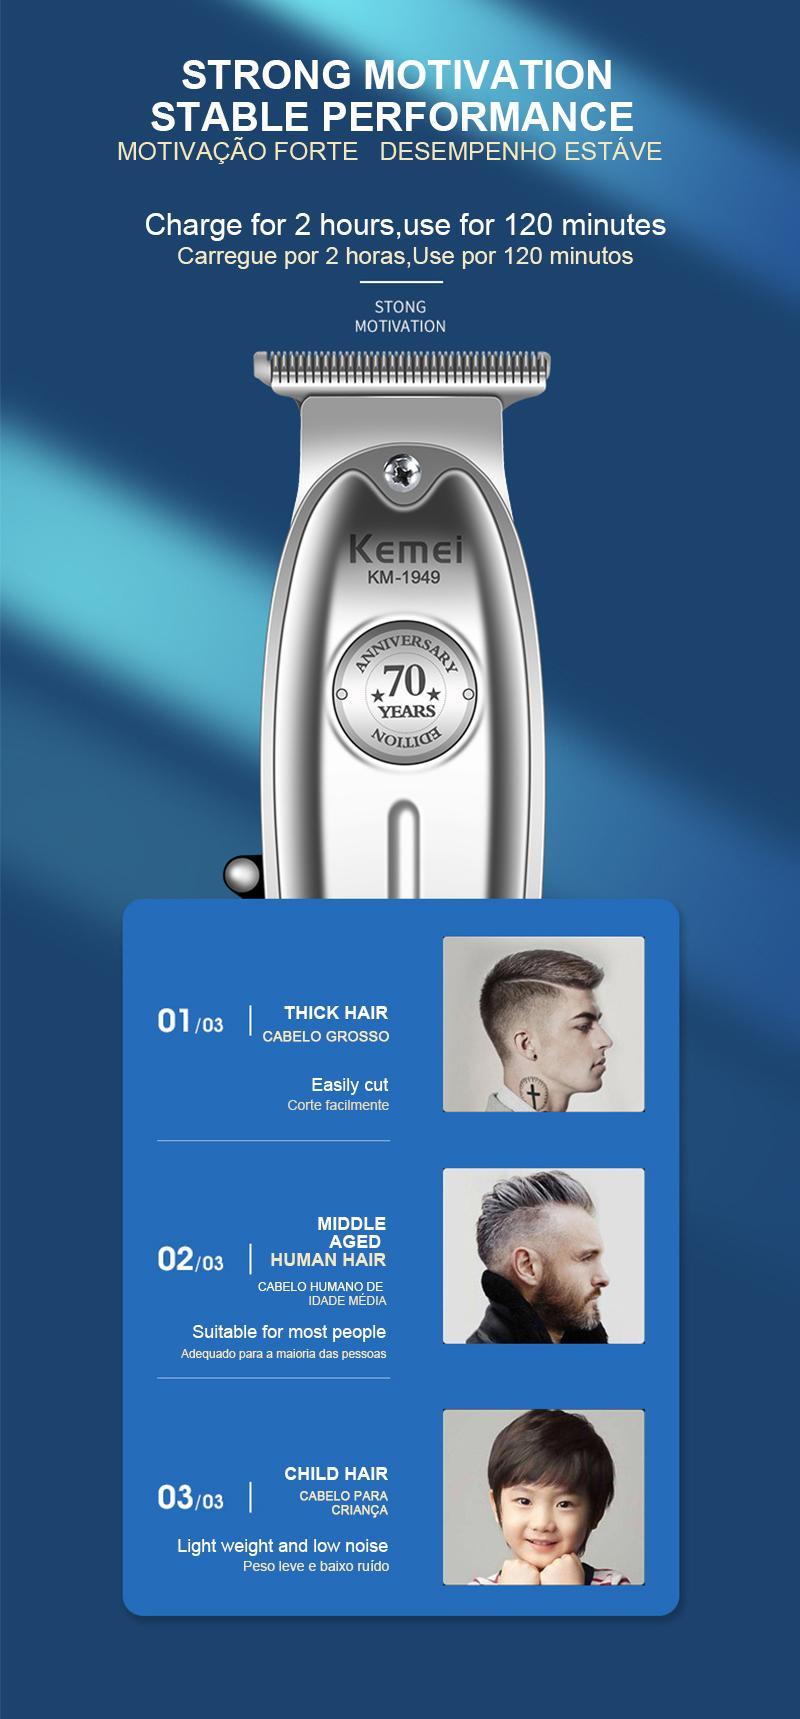 Kemei 1949 Professional professional barber kit Trimmer 0mm Baldheaded T Blade Finish Haircut Machine bwkf WvmQO